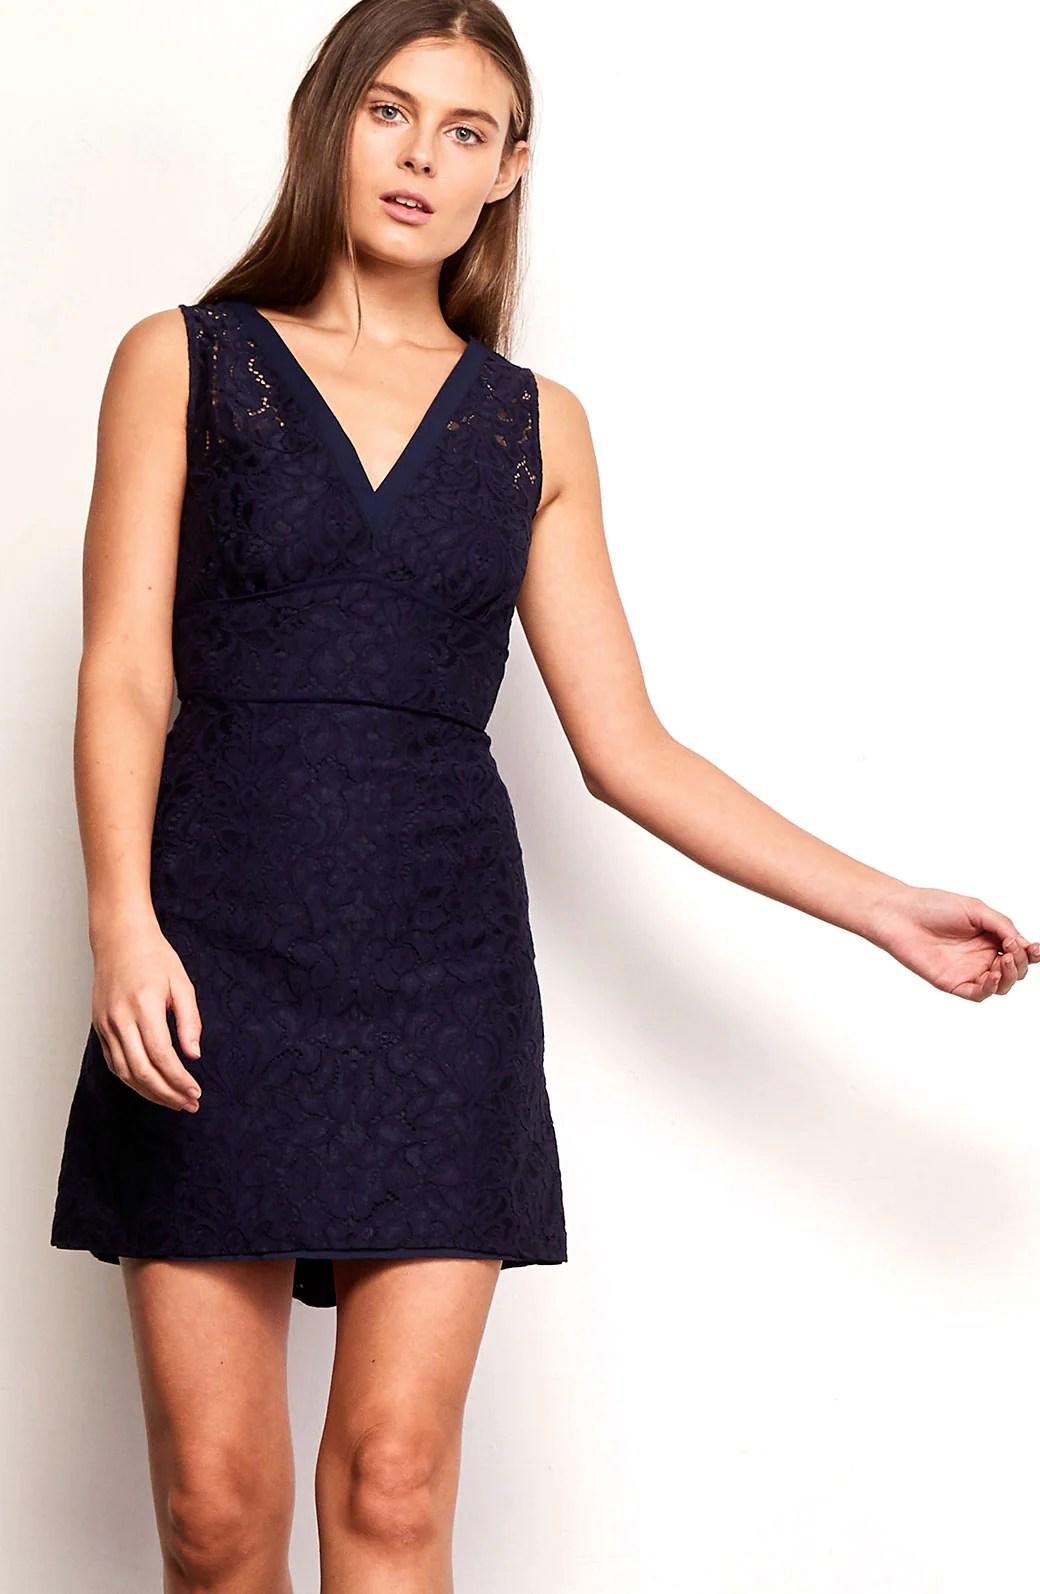 Fullsize Of Navy Blue Lace Dress